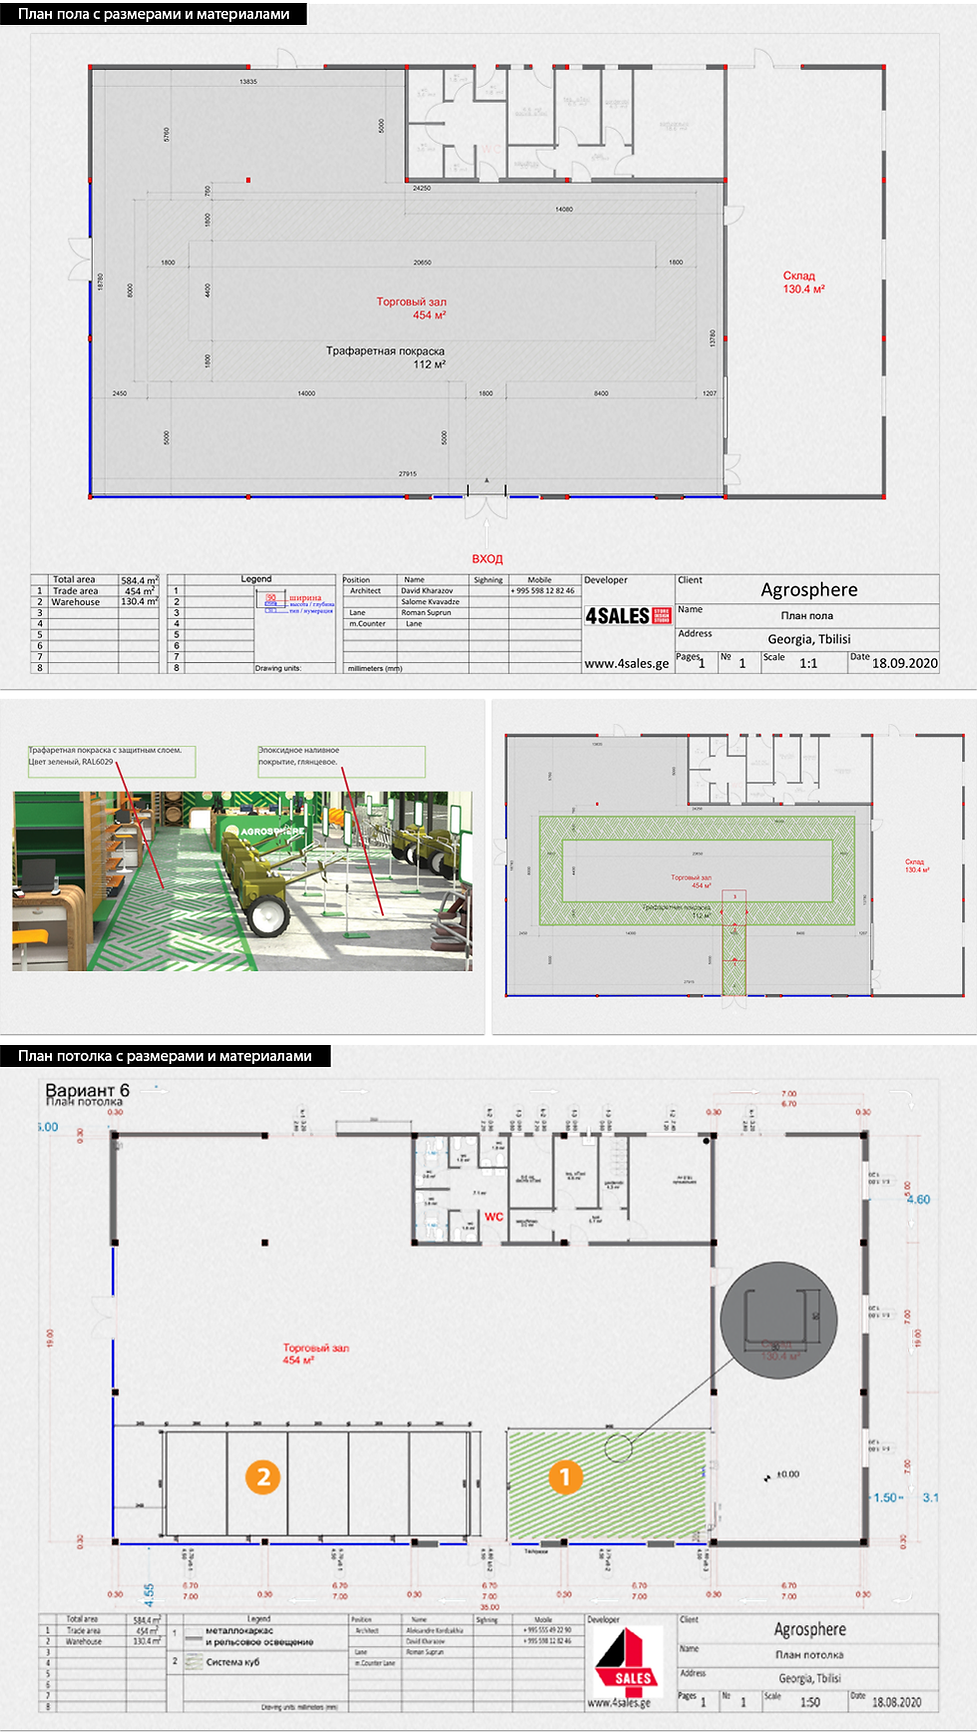 magaziis dizaini da proeqtireba 06.png